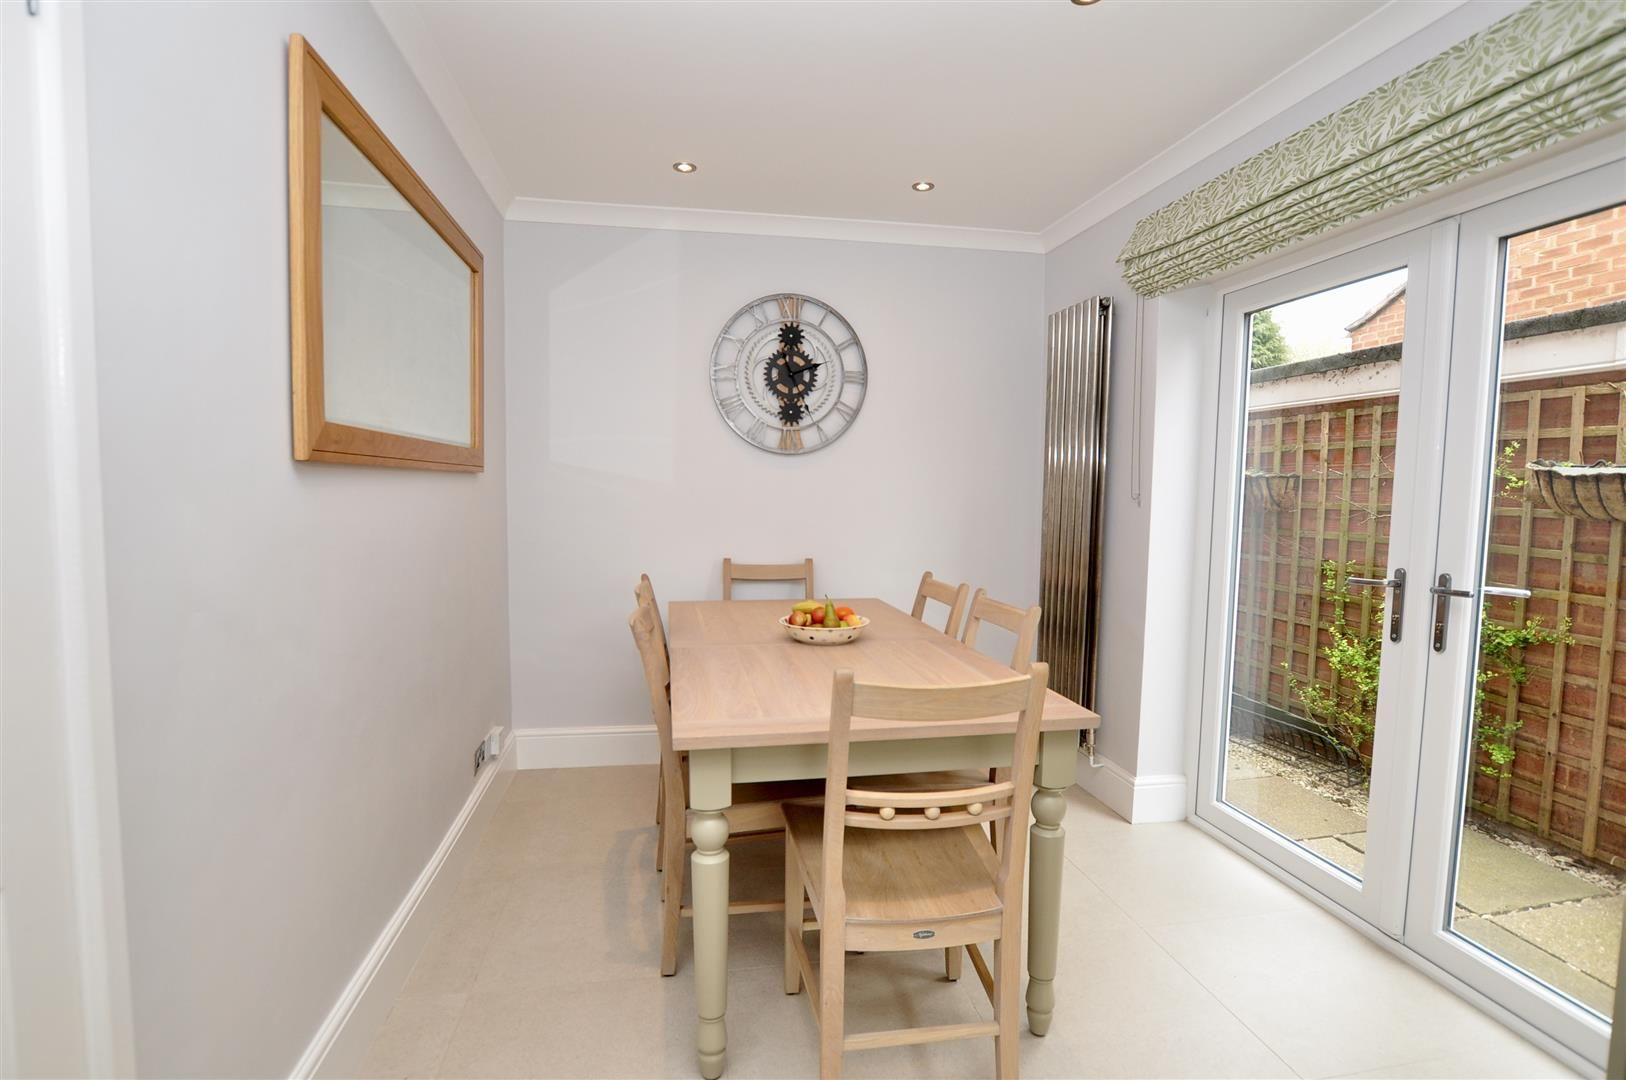 4 bed link-detached-house for sale in Hagley  - Property Image 3